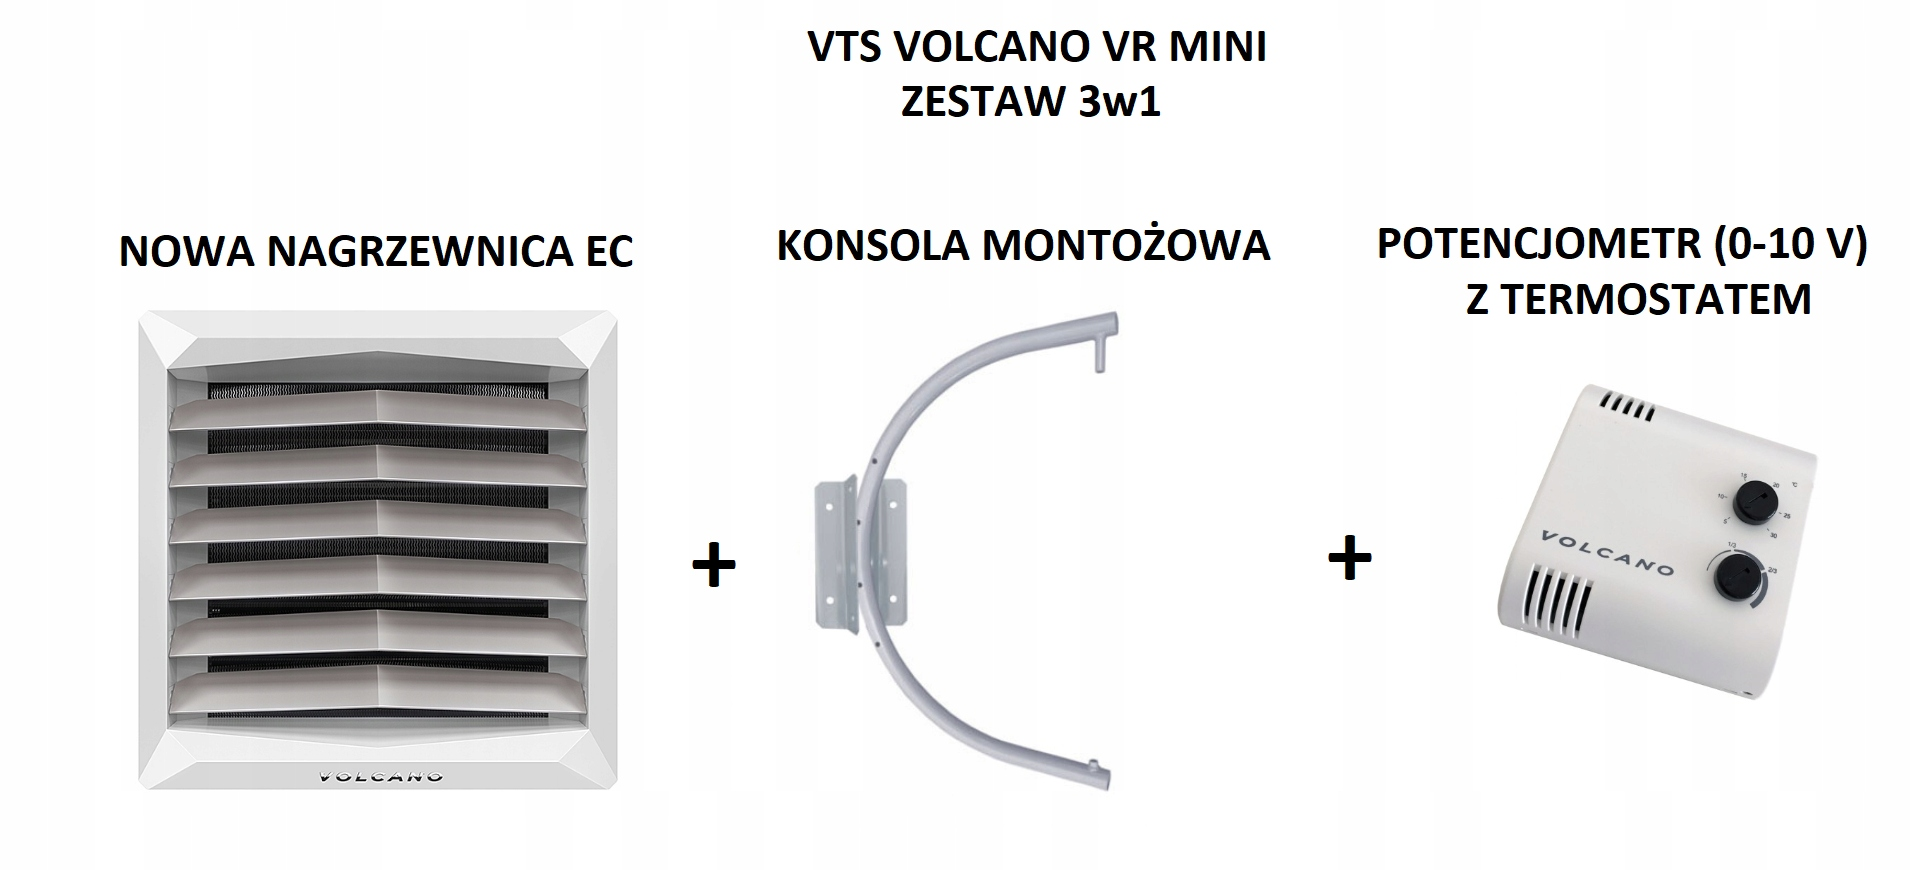 Volcano mini